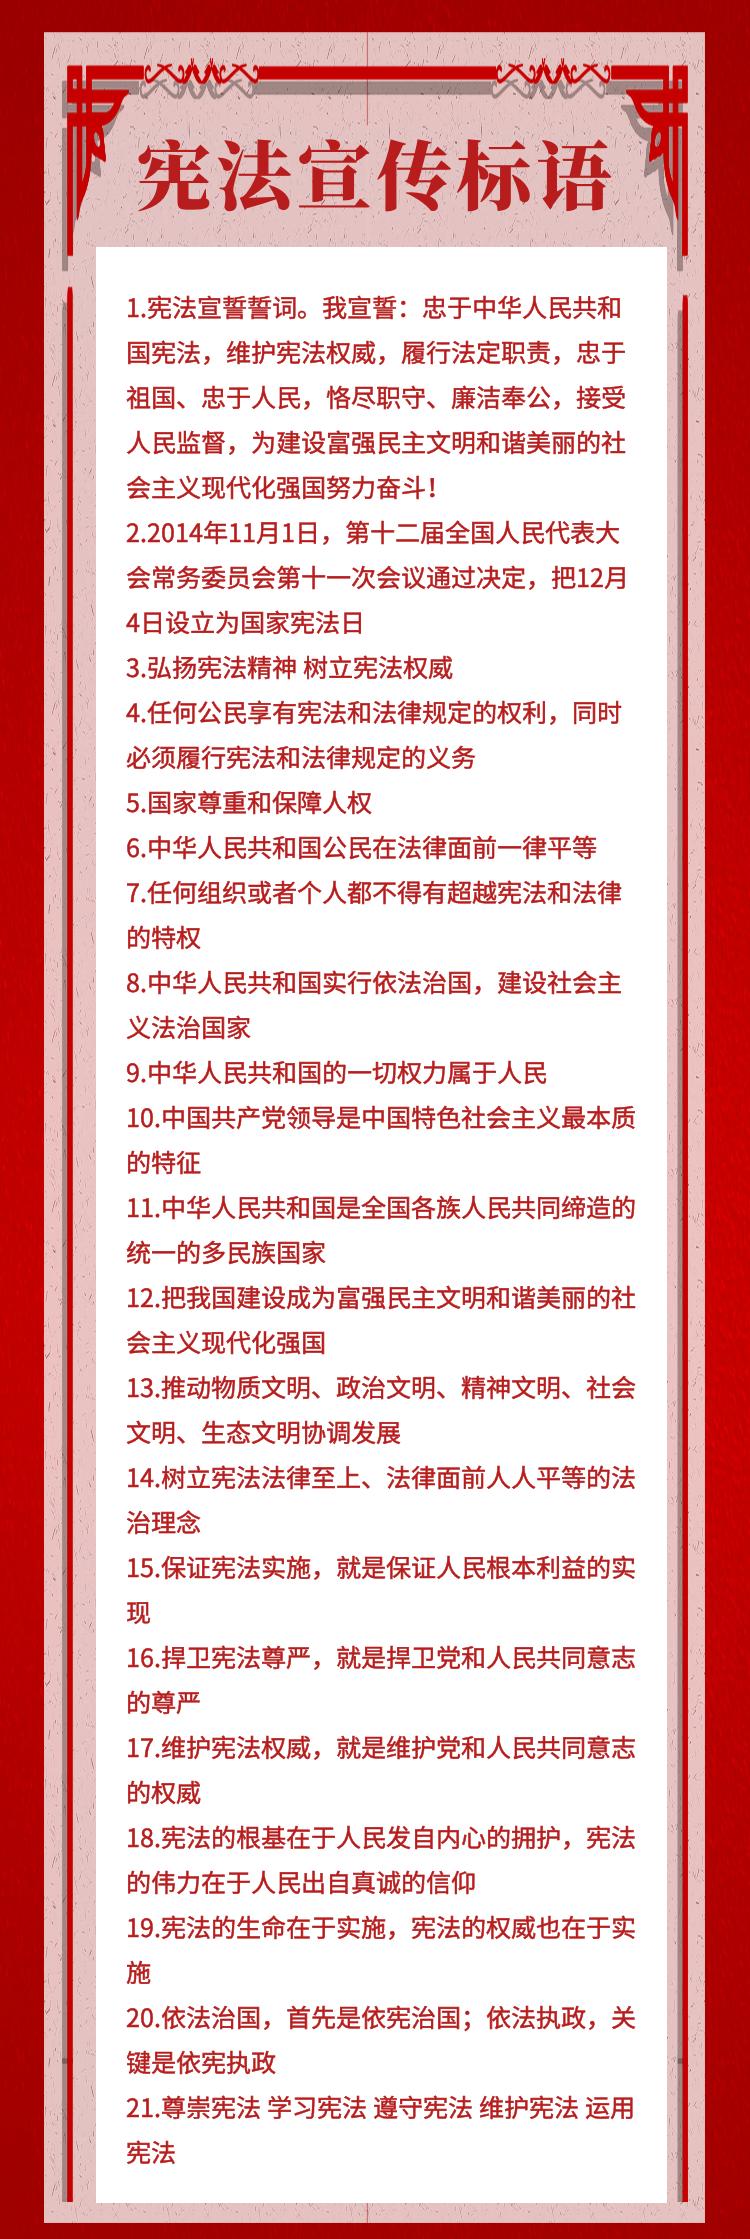 宪法标语_副本.png